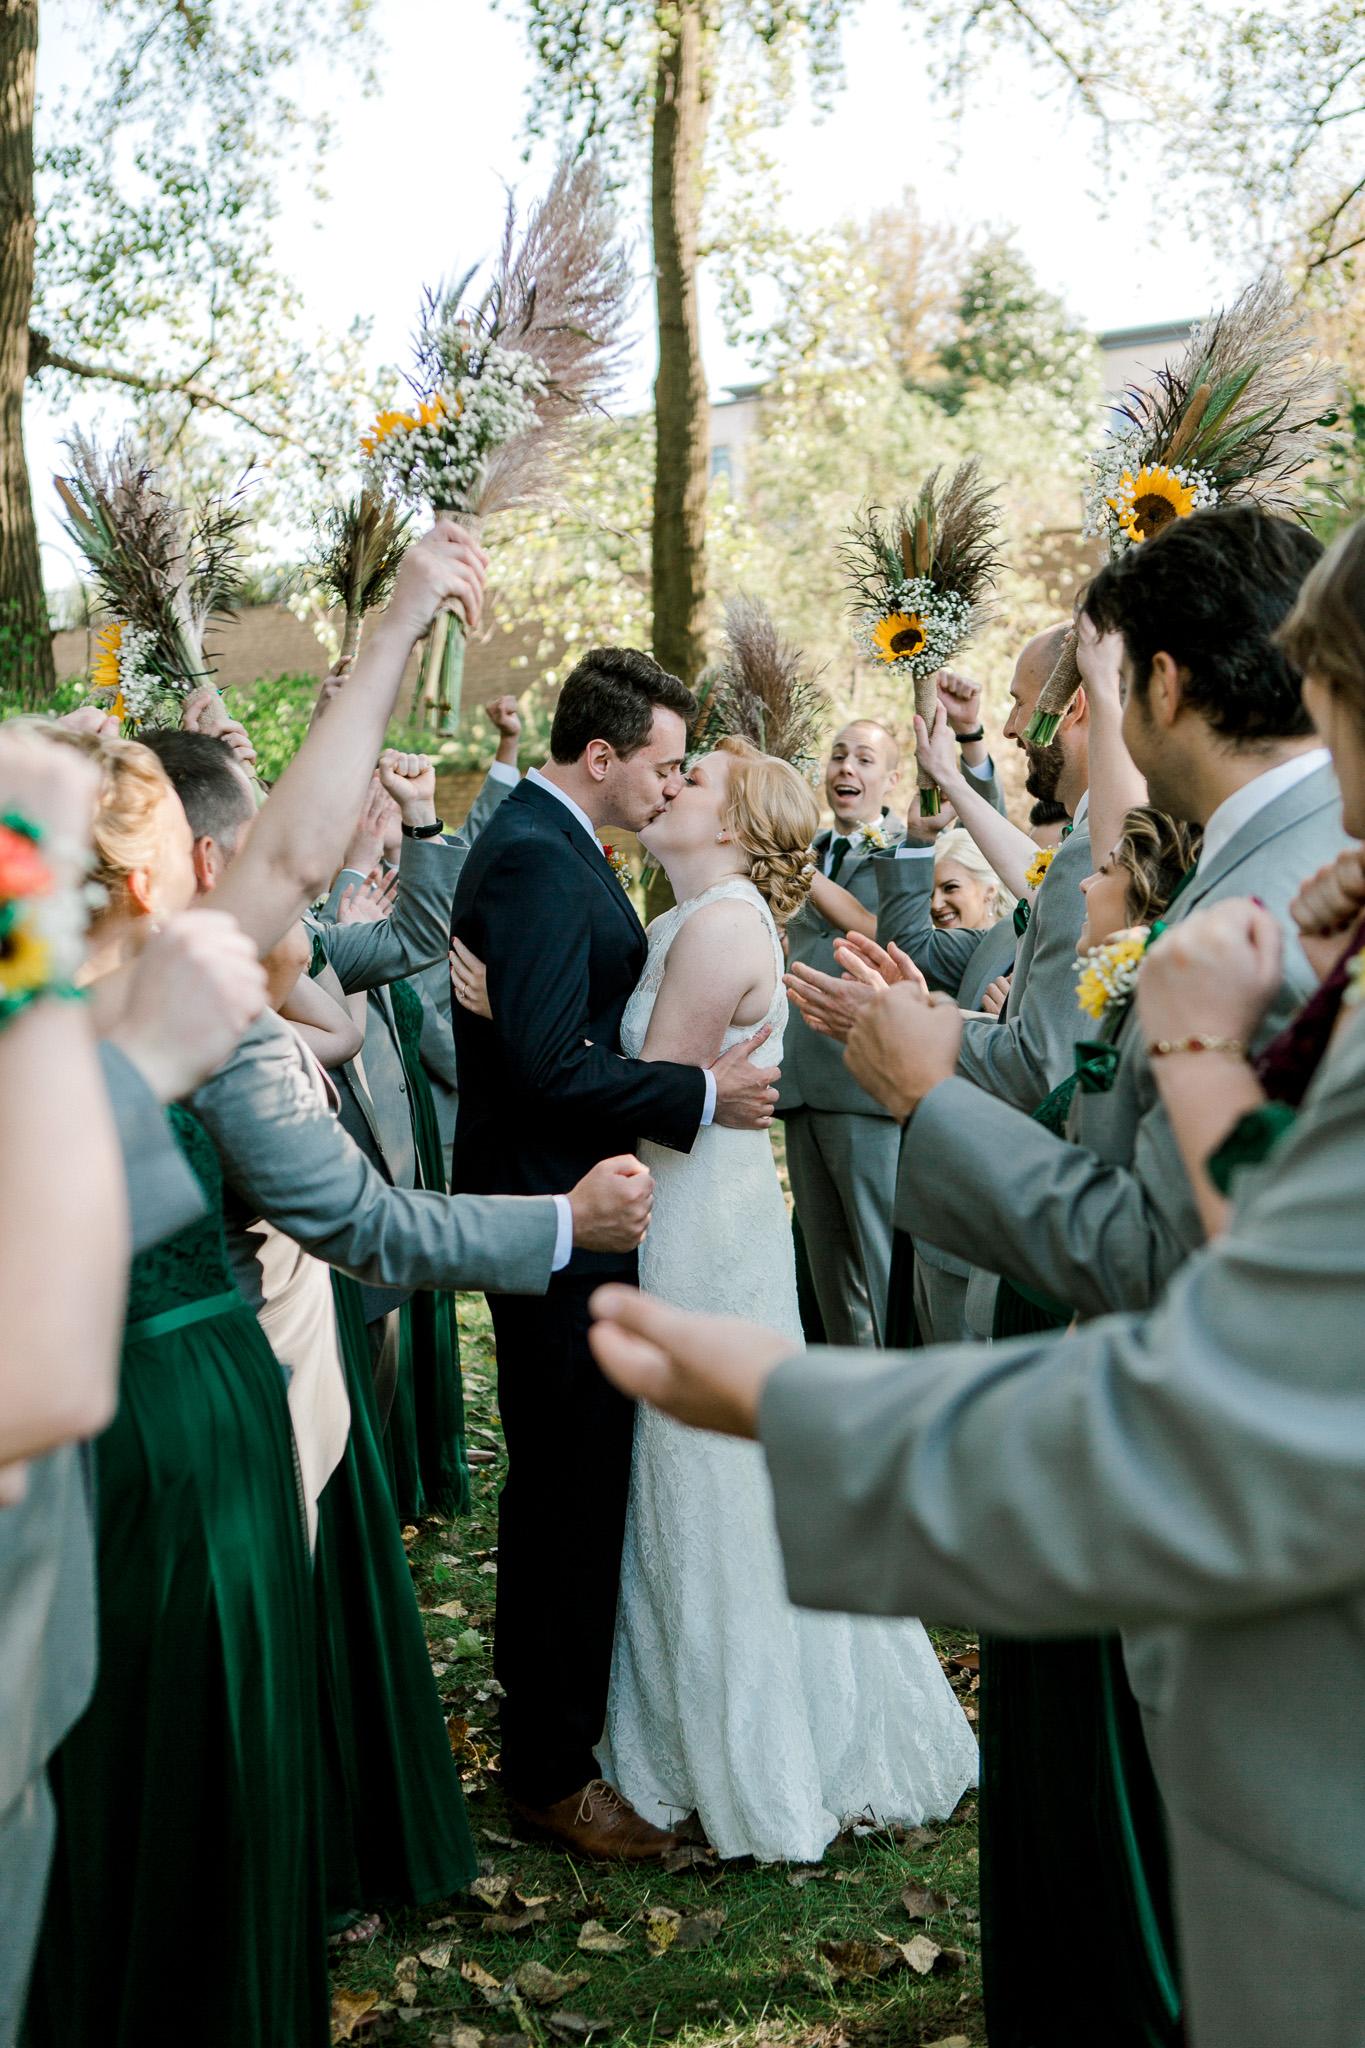 SNEAKPEEKS-2018.09.22 Alexandra and Cameron wedding-8.jpg